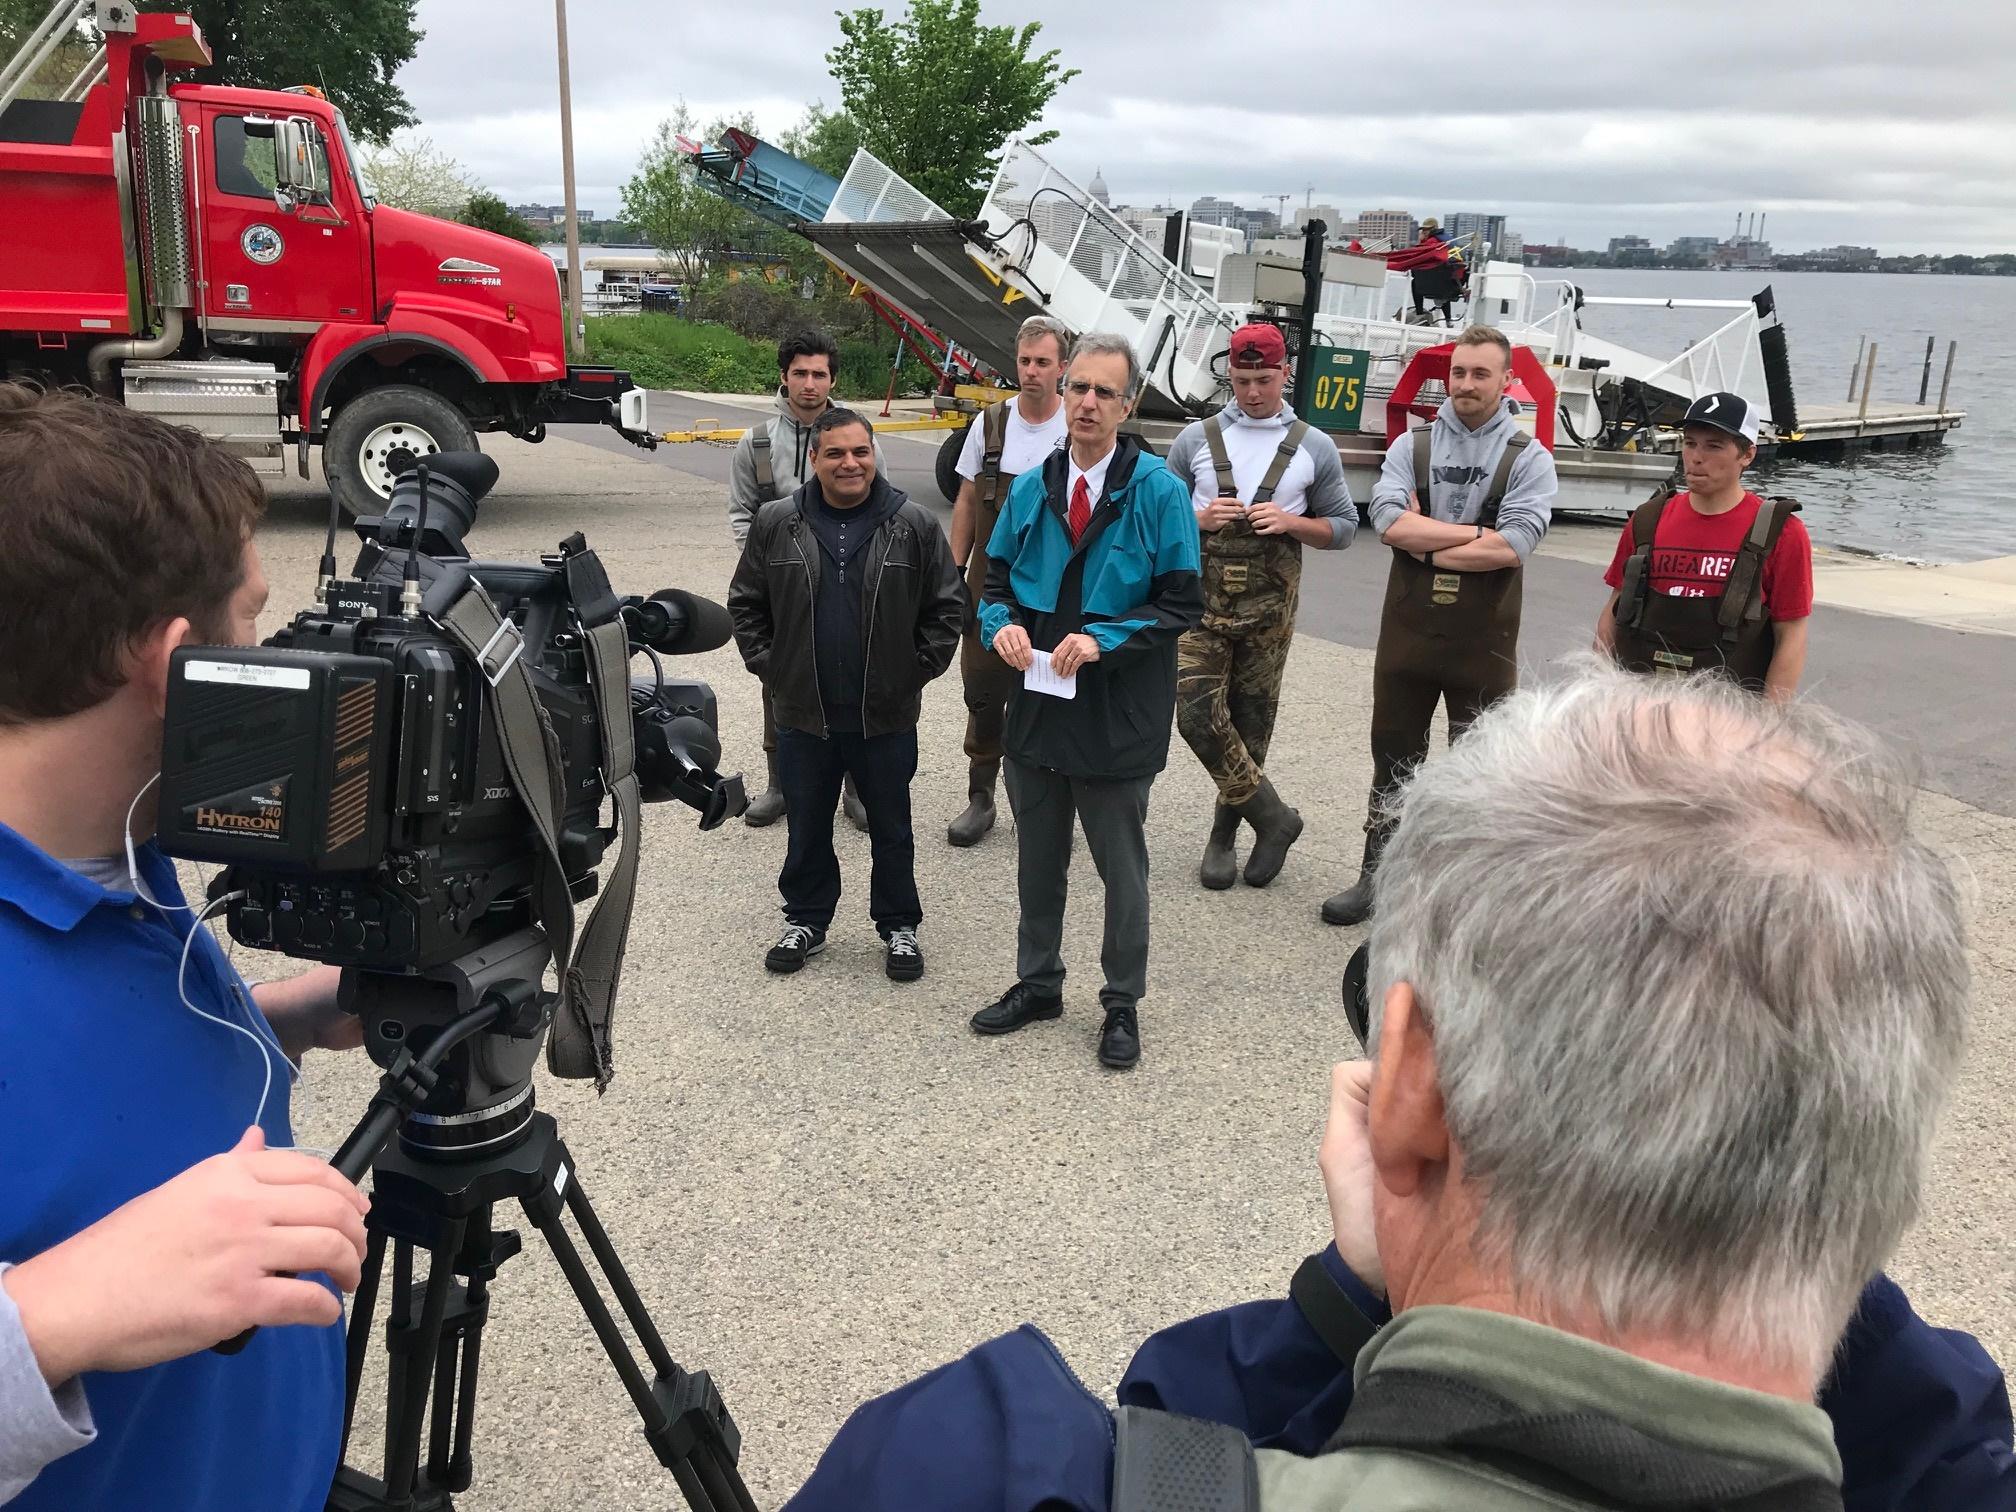 Yogesh joins County Exec Joe Parisi to discuss aquatic plant harvesting and dredging.